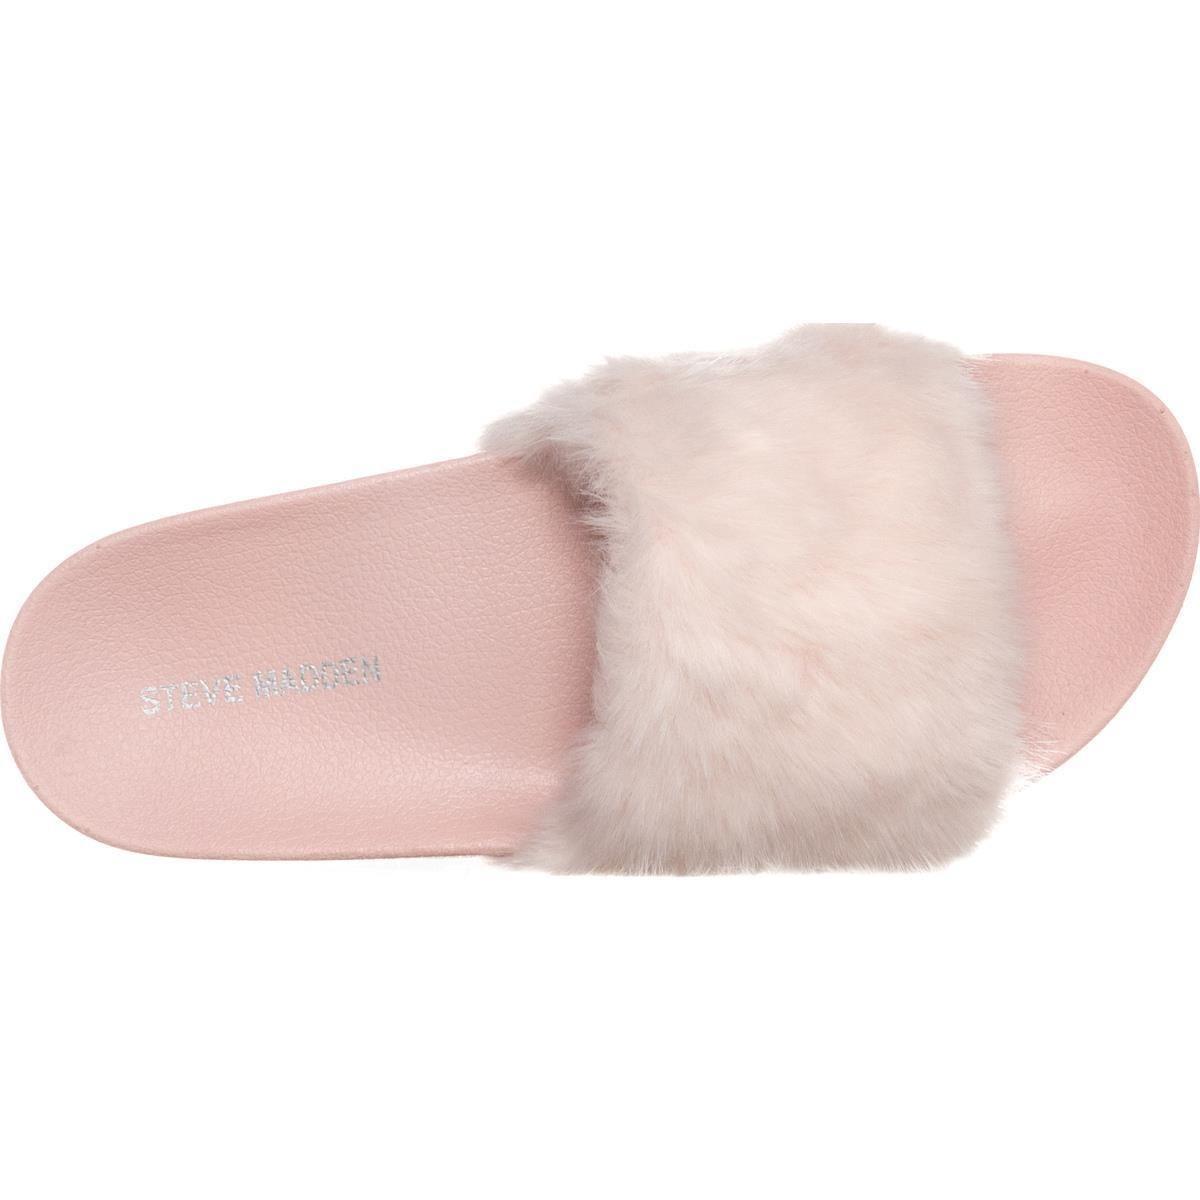 steve madden softey sherling cuffed slide sandals 194 light pink 9